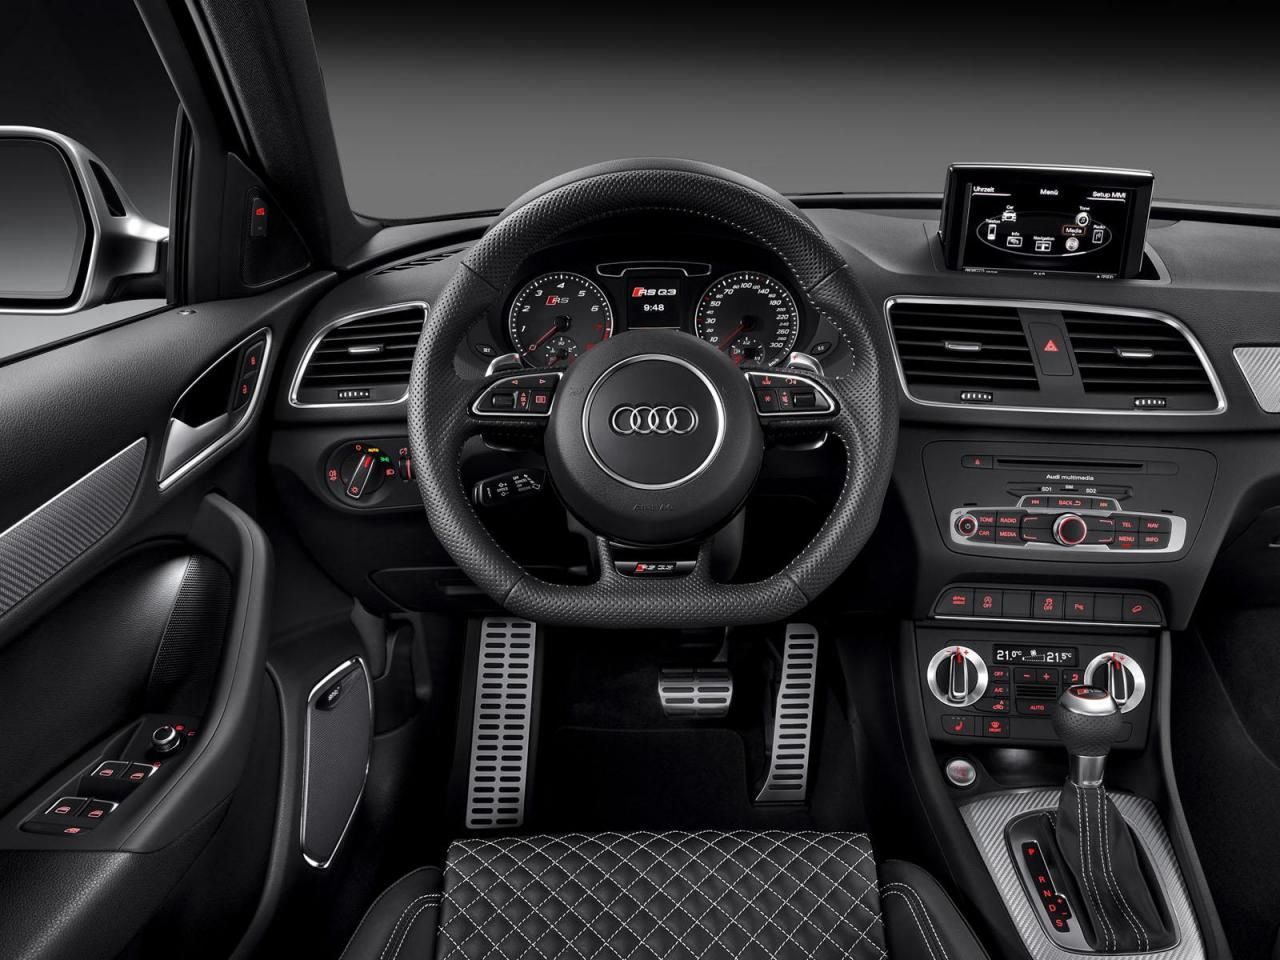 Blog Utechka Foto 2014 Audi Rs Q3 Polnostyu Raskryta Audi Rs6 Avant Audi Q3 Audi S5